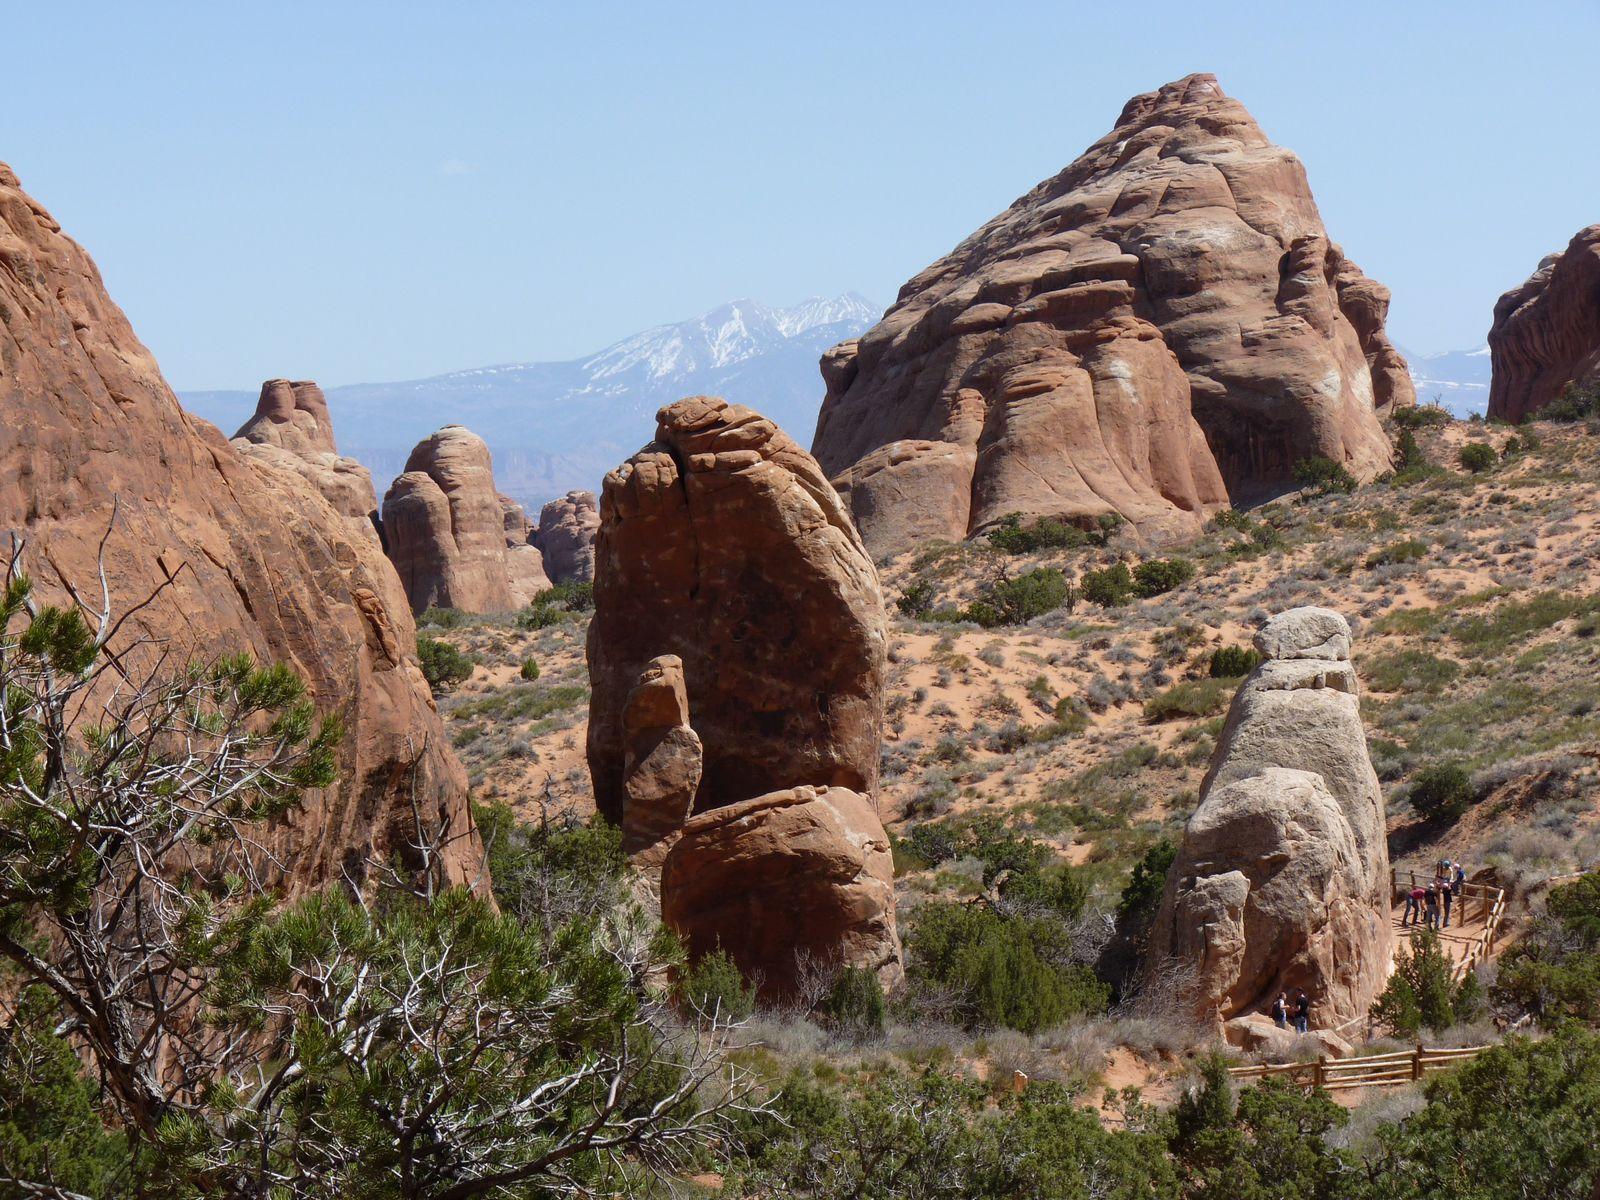 En toile de fond , les montagnes La Sal, grandiose.